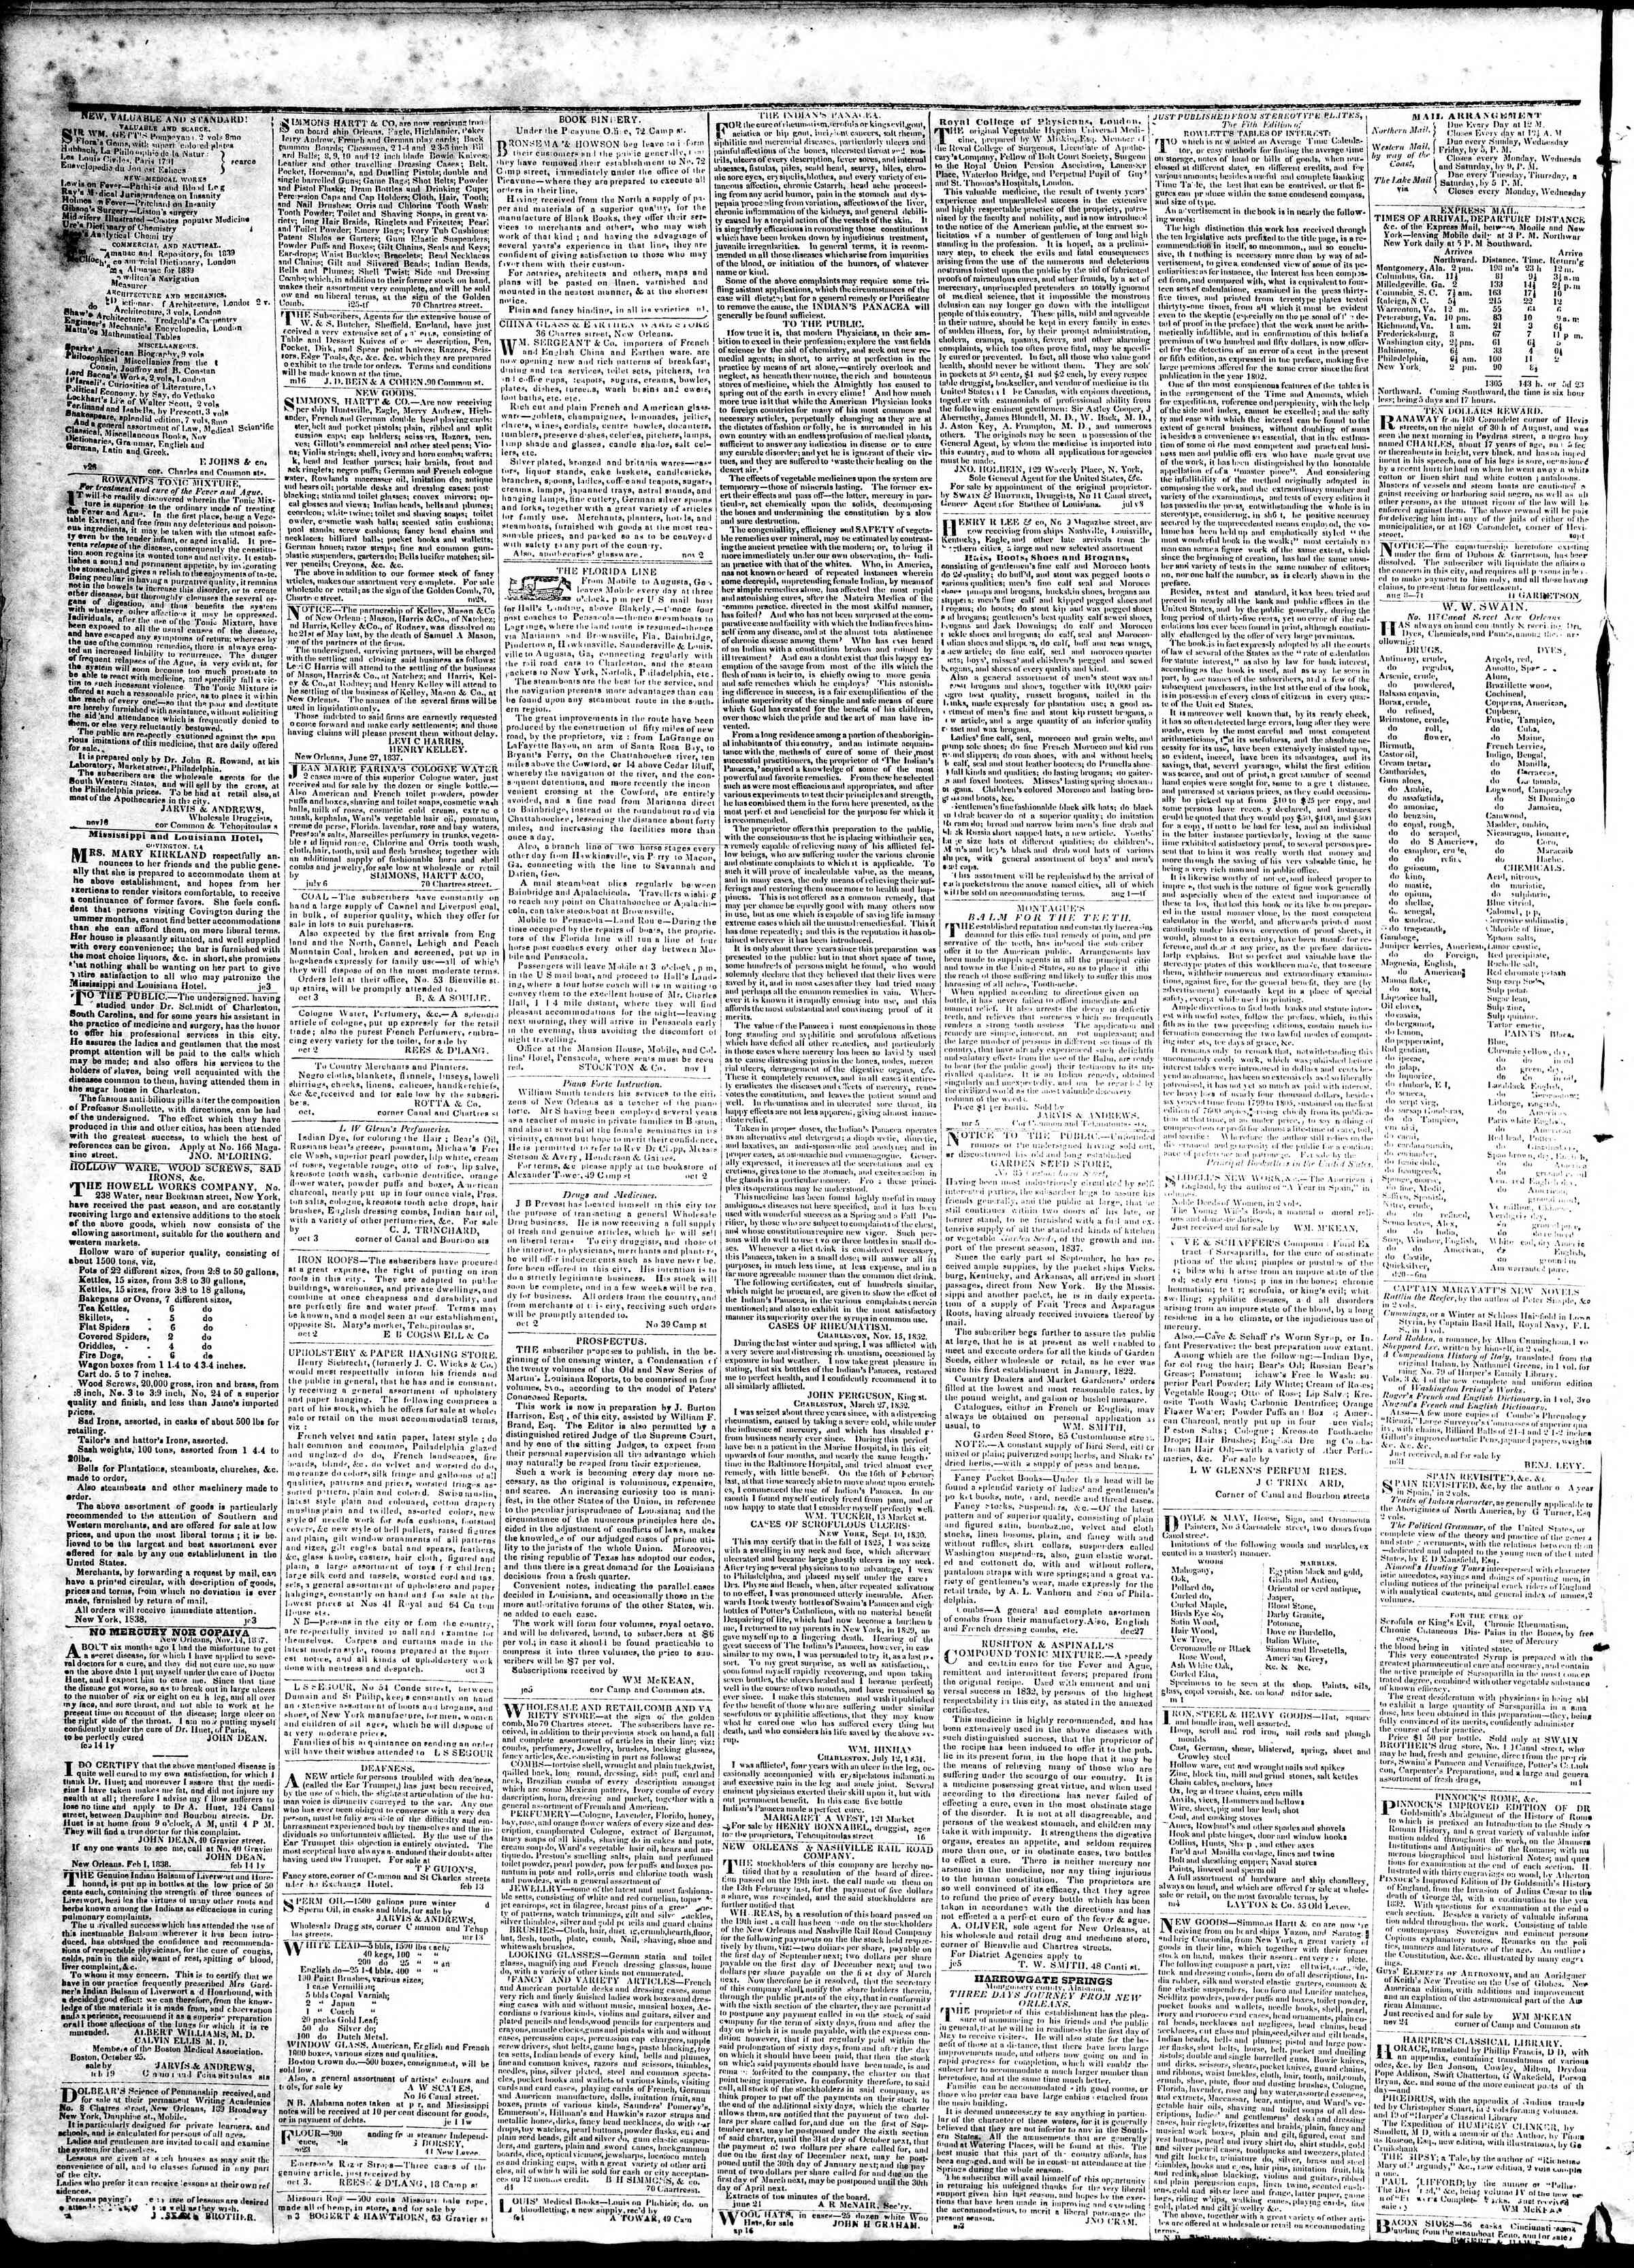 March 6, 1839 Tarihli True American Gazetesi Sayfa 4